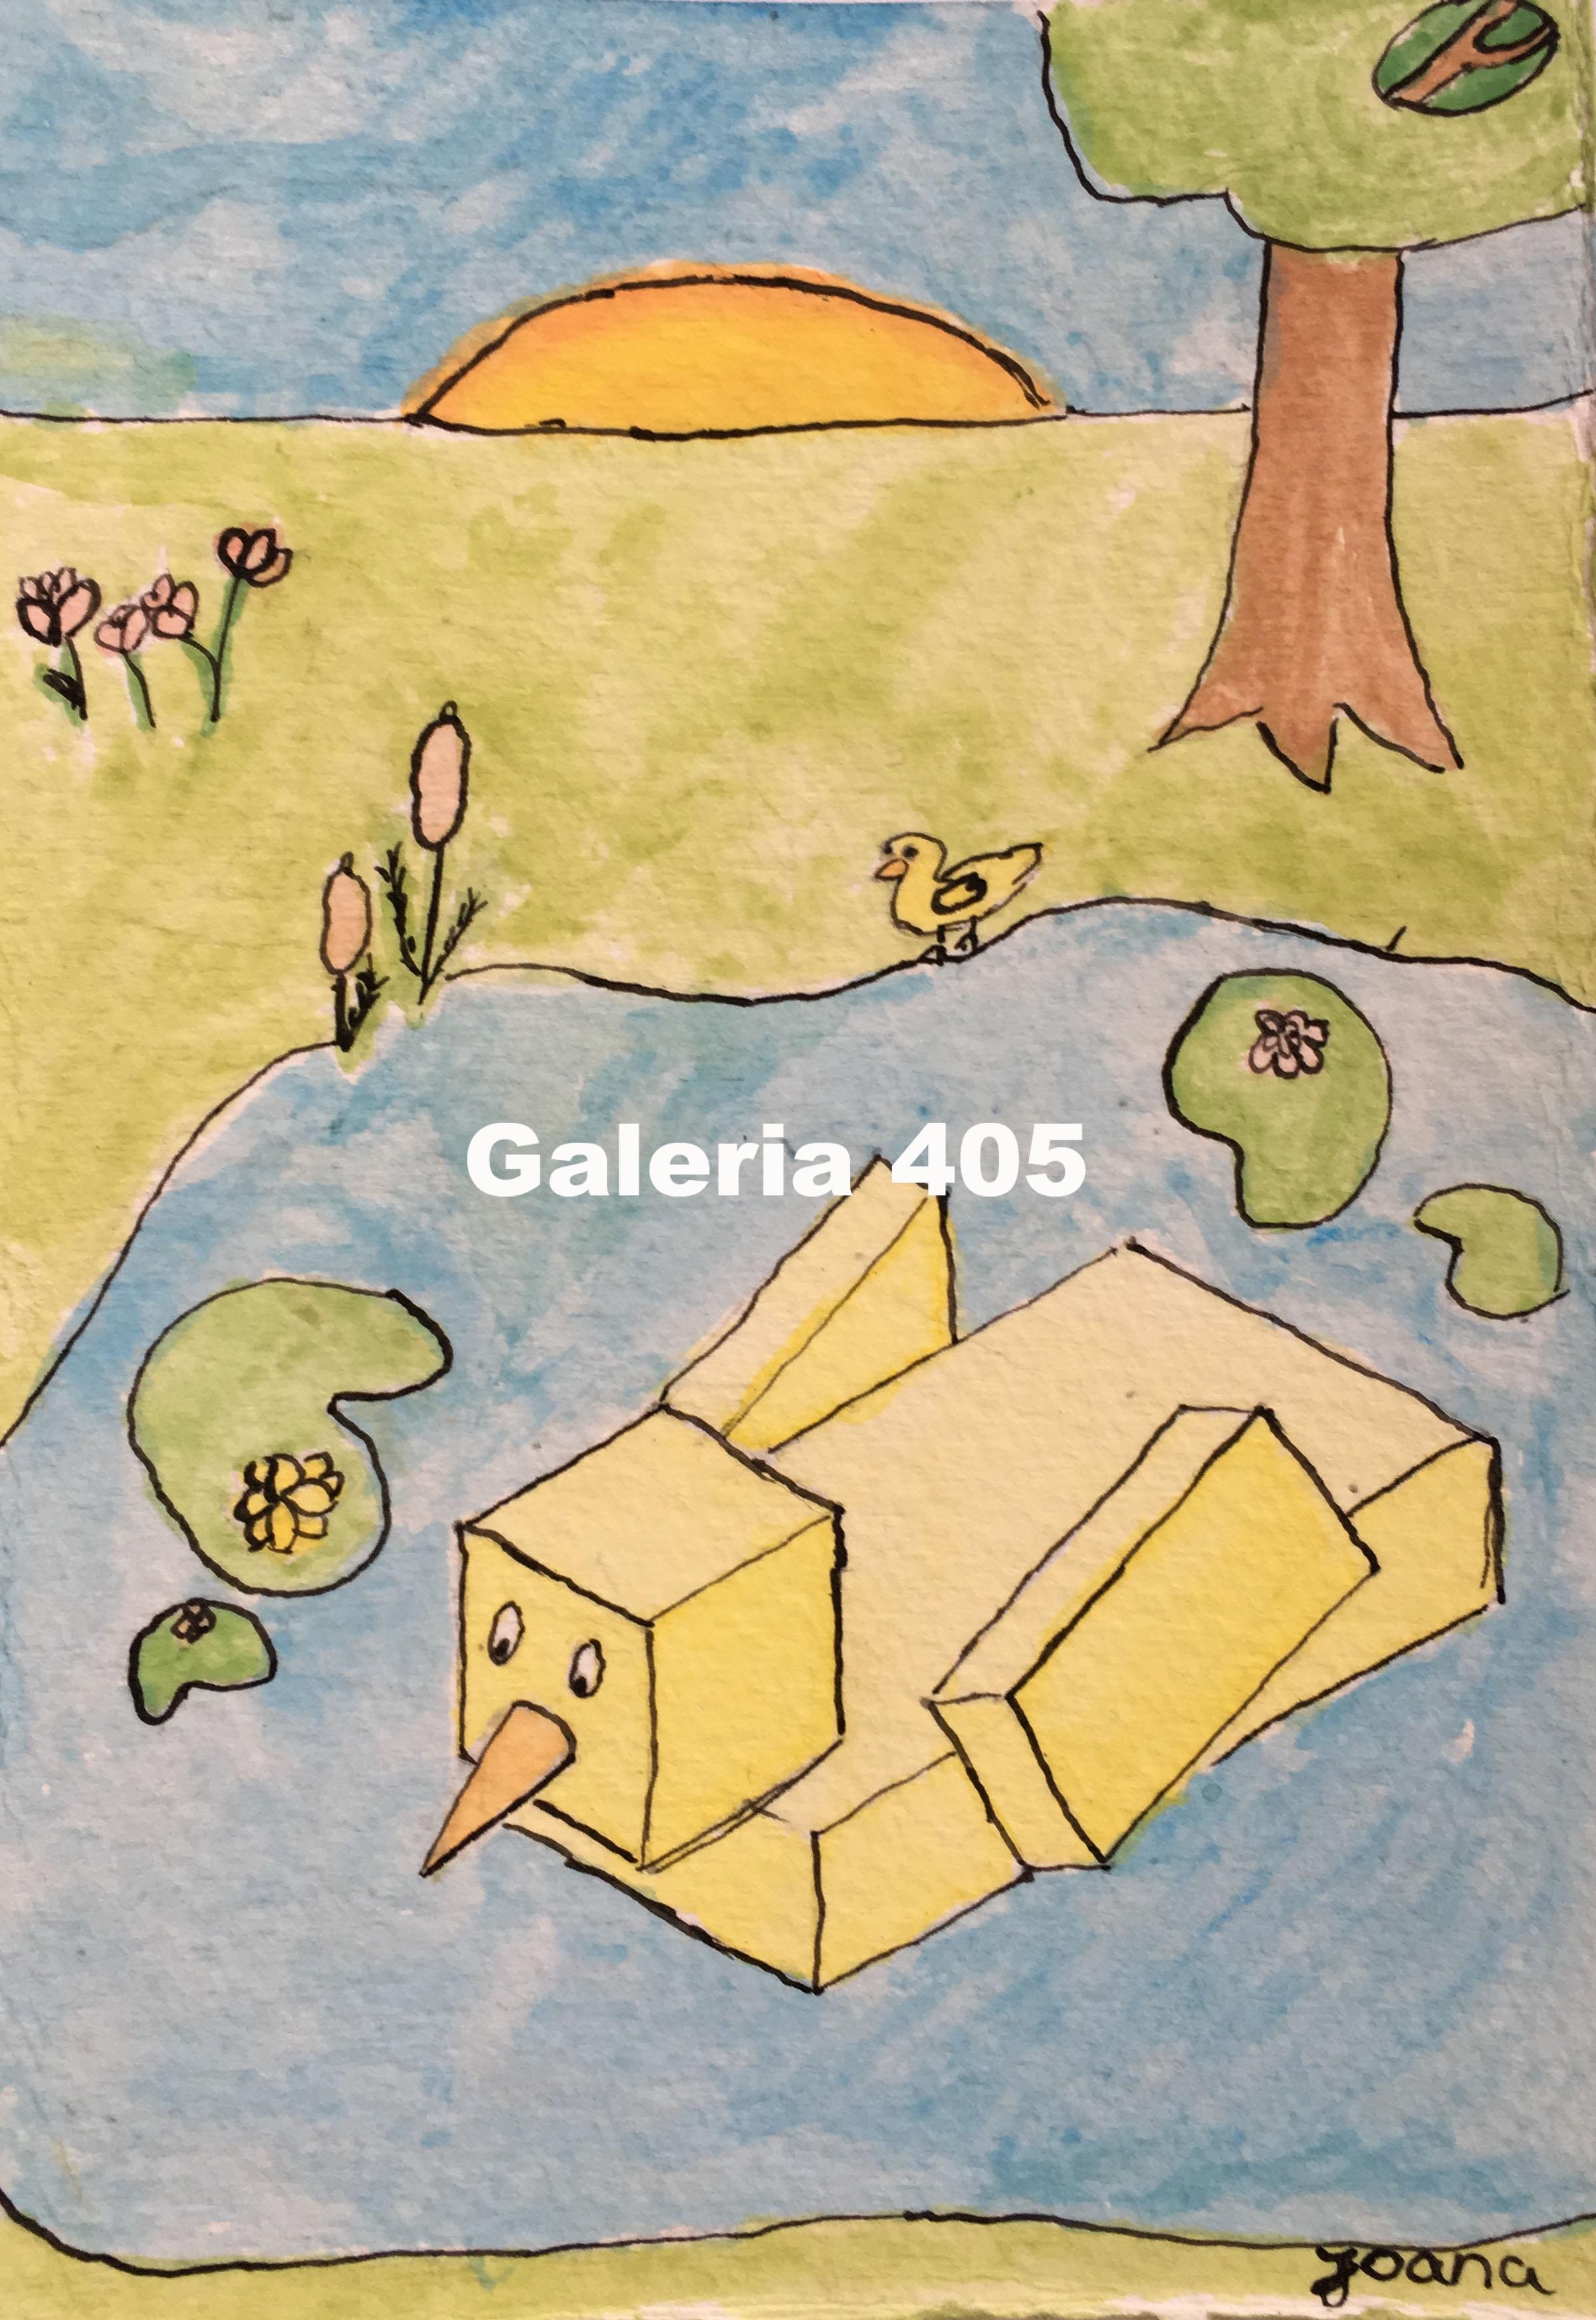 IMG_8759 copy